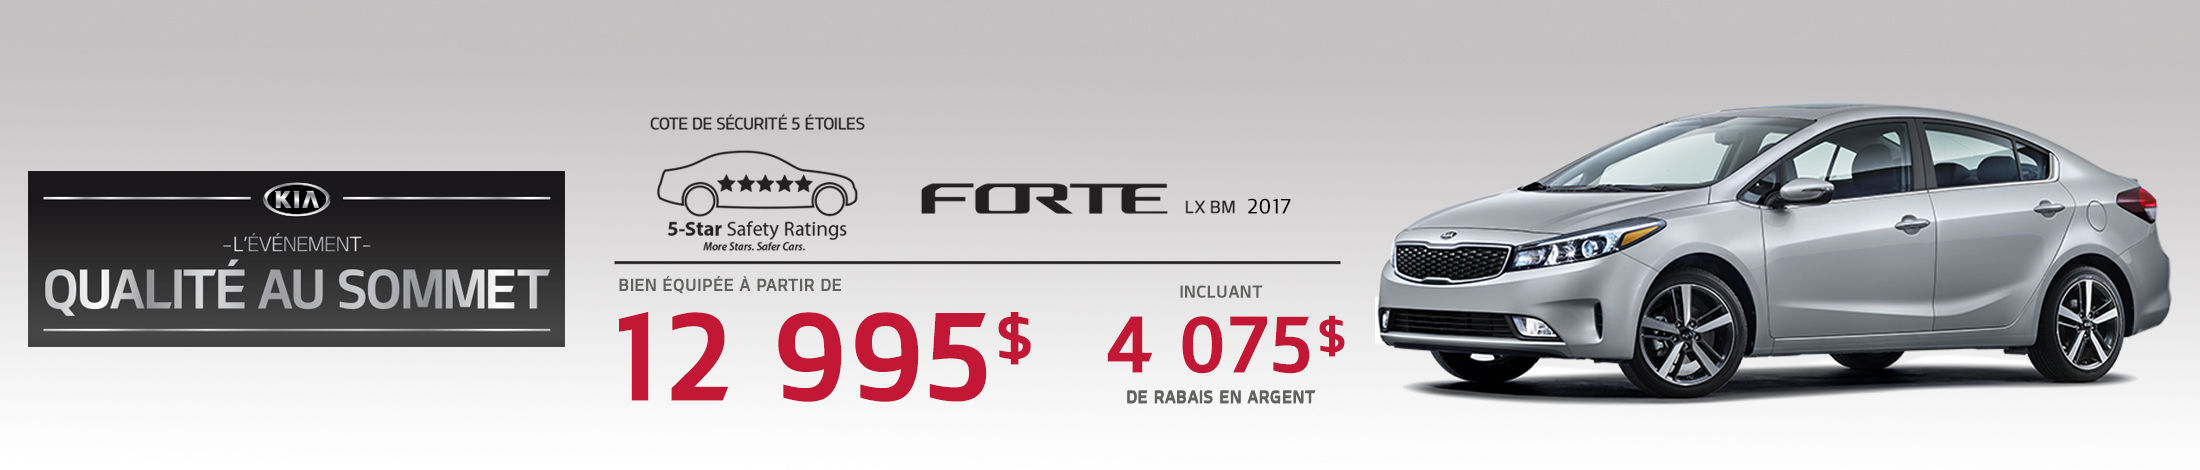 Kia Forte Promotion septembre banner